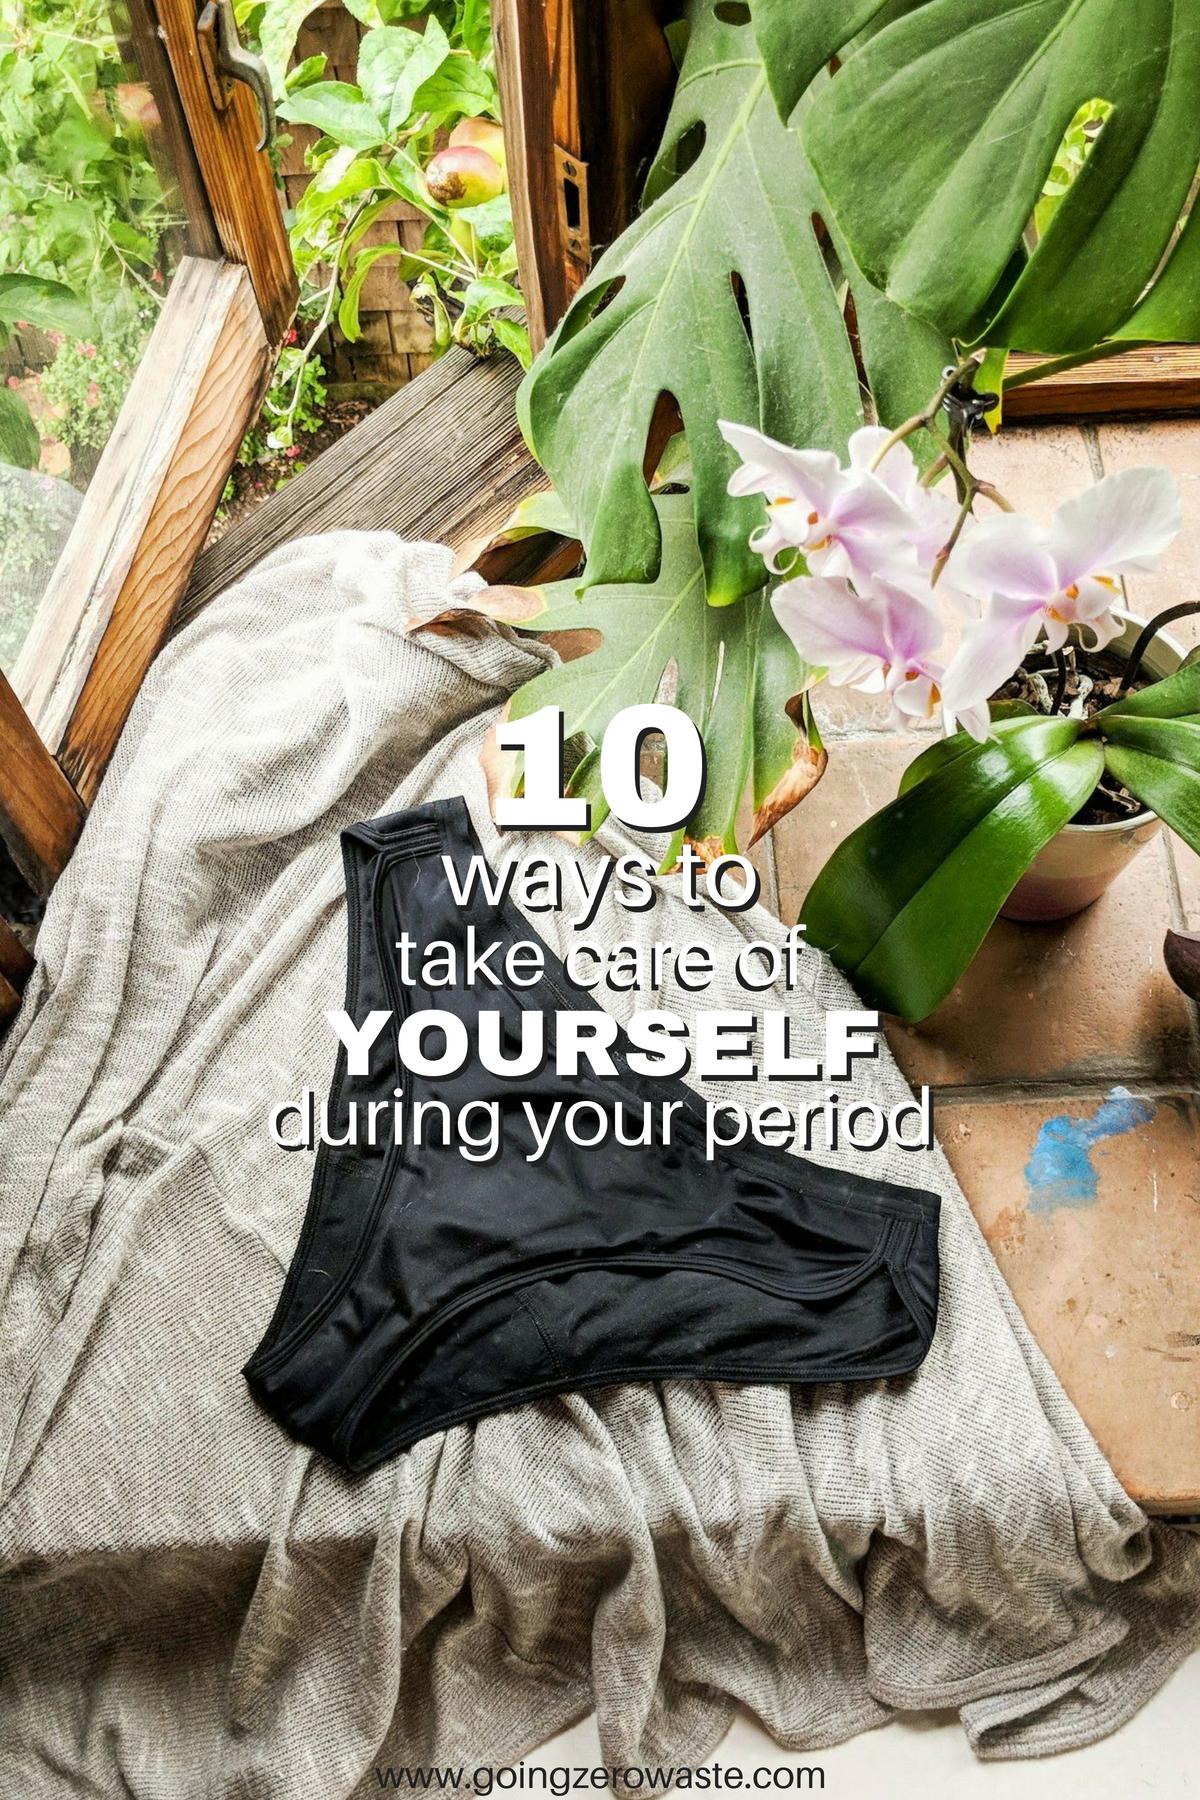 10 Ways to take care of yourself during your period from www.goingzerowaste.com #wellness #zerowaste #periods